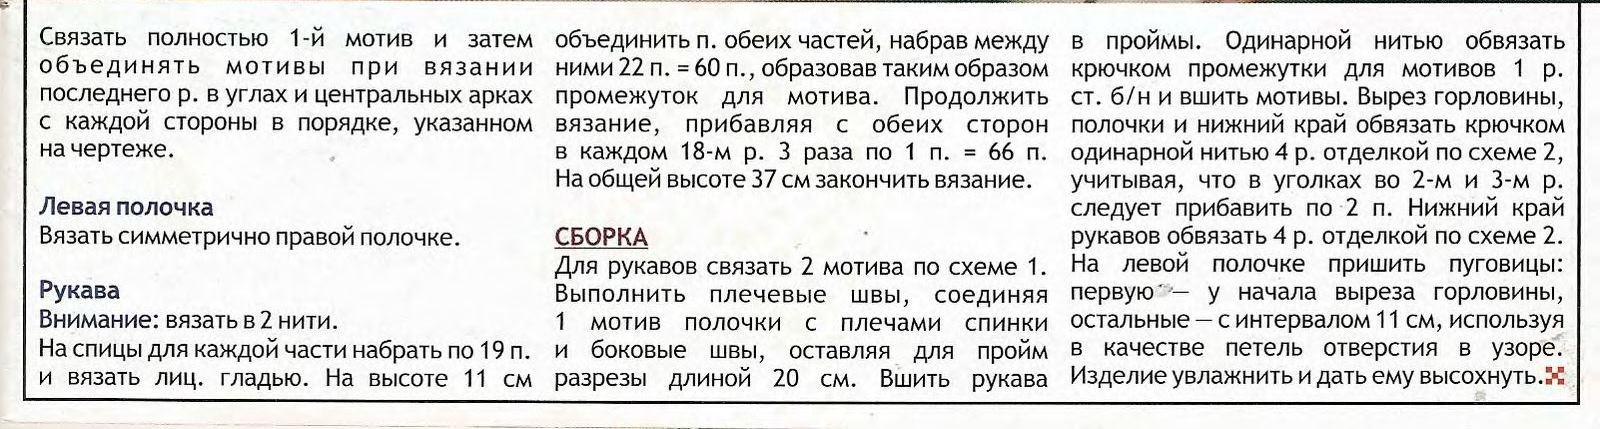 2018_ВДВсп_2 (3)